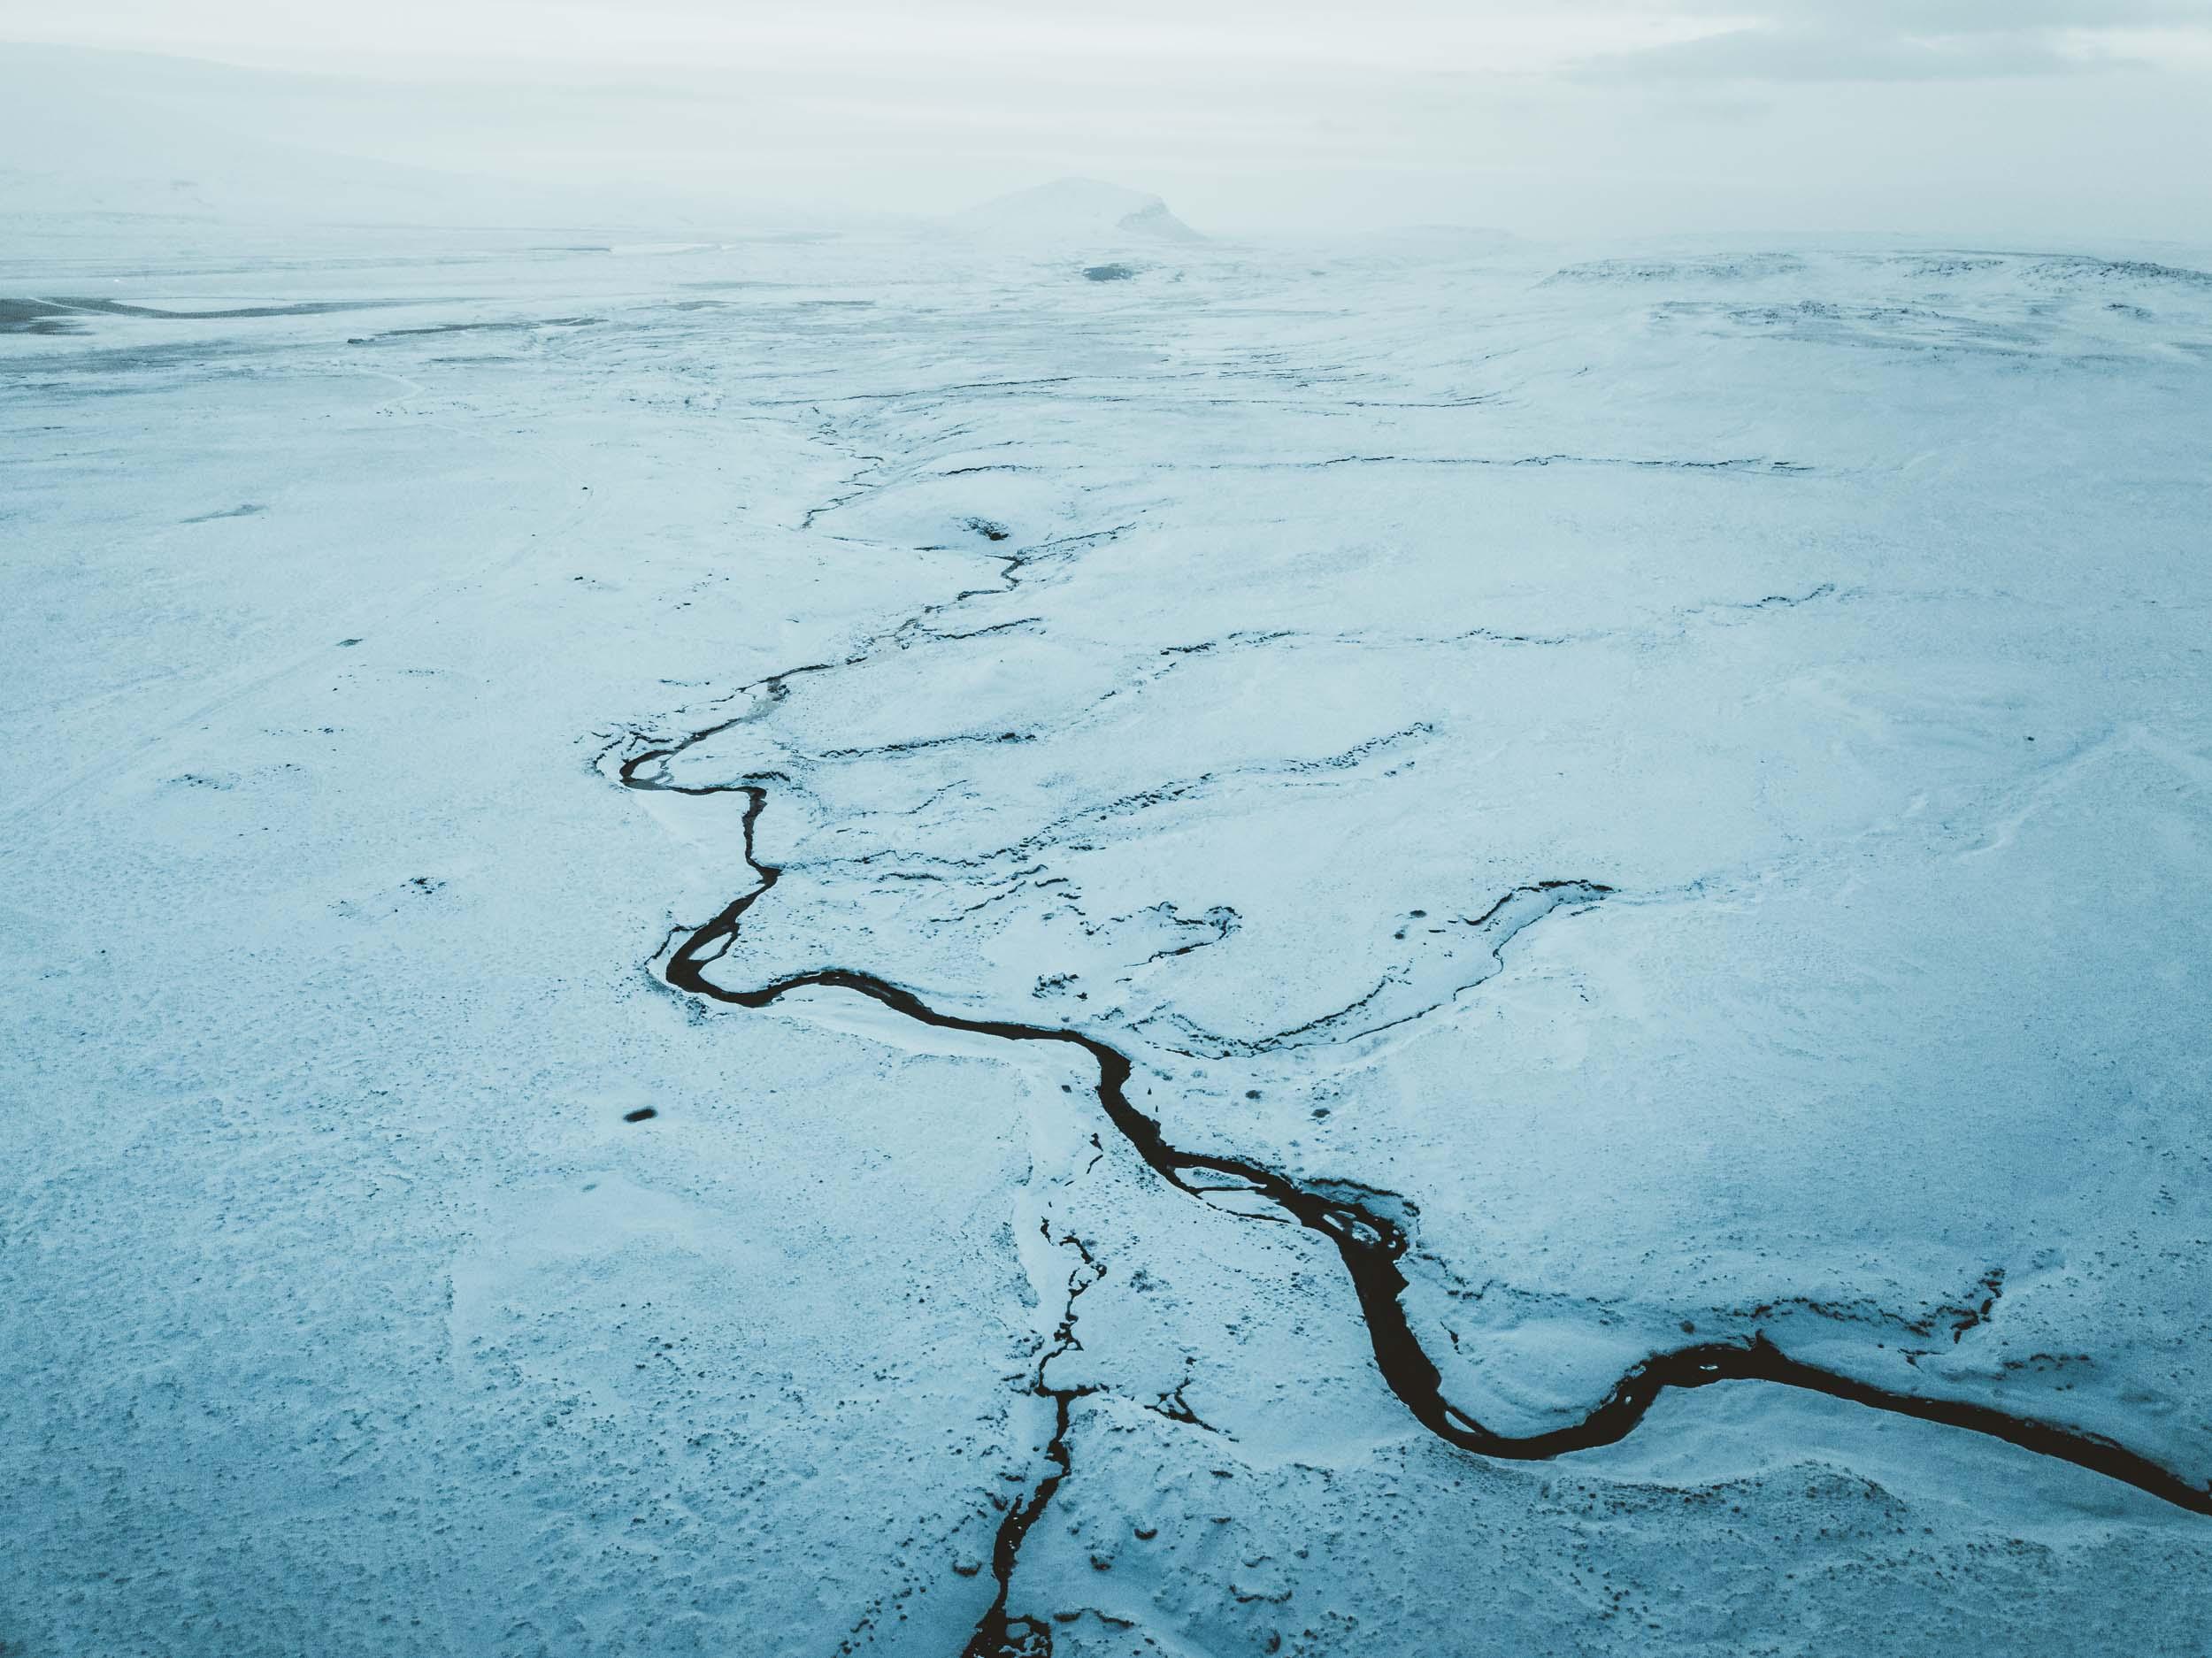 Iceland_Jan_2019_ByTomKahler_Lowres (253 of 262).jpg